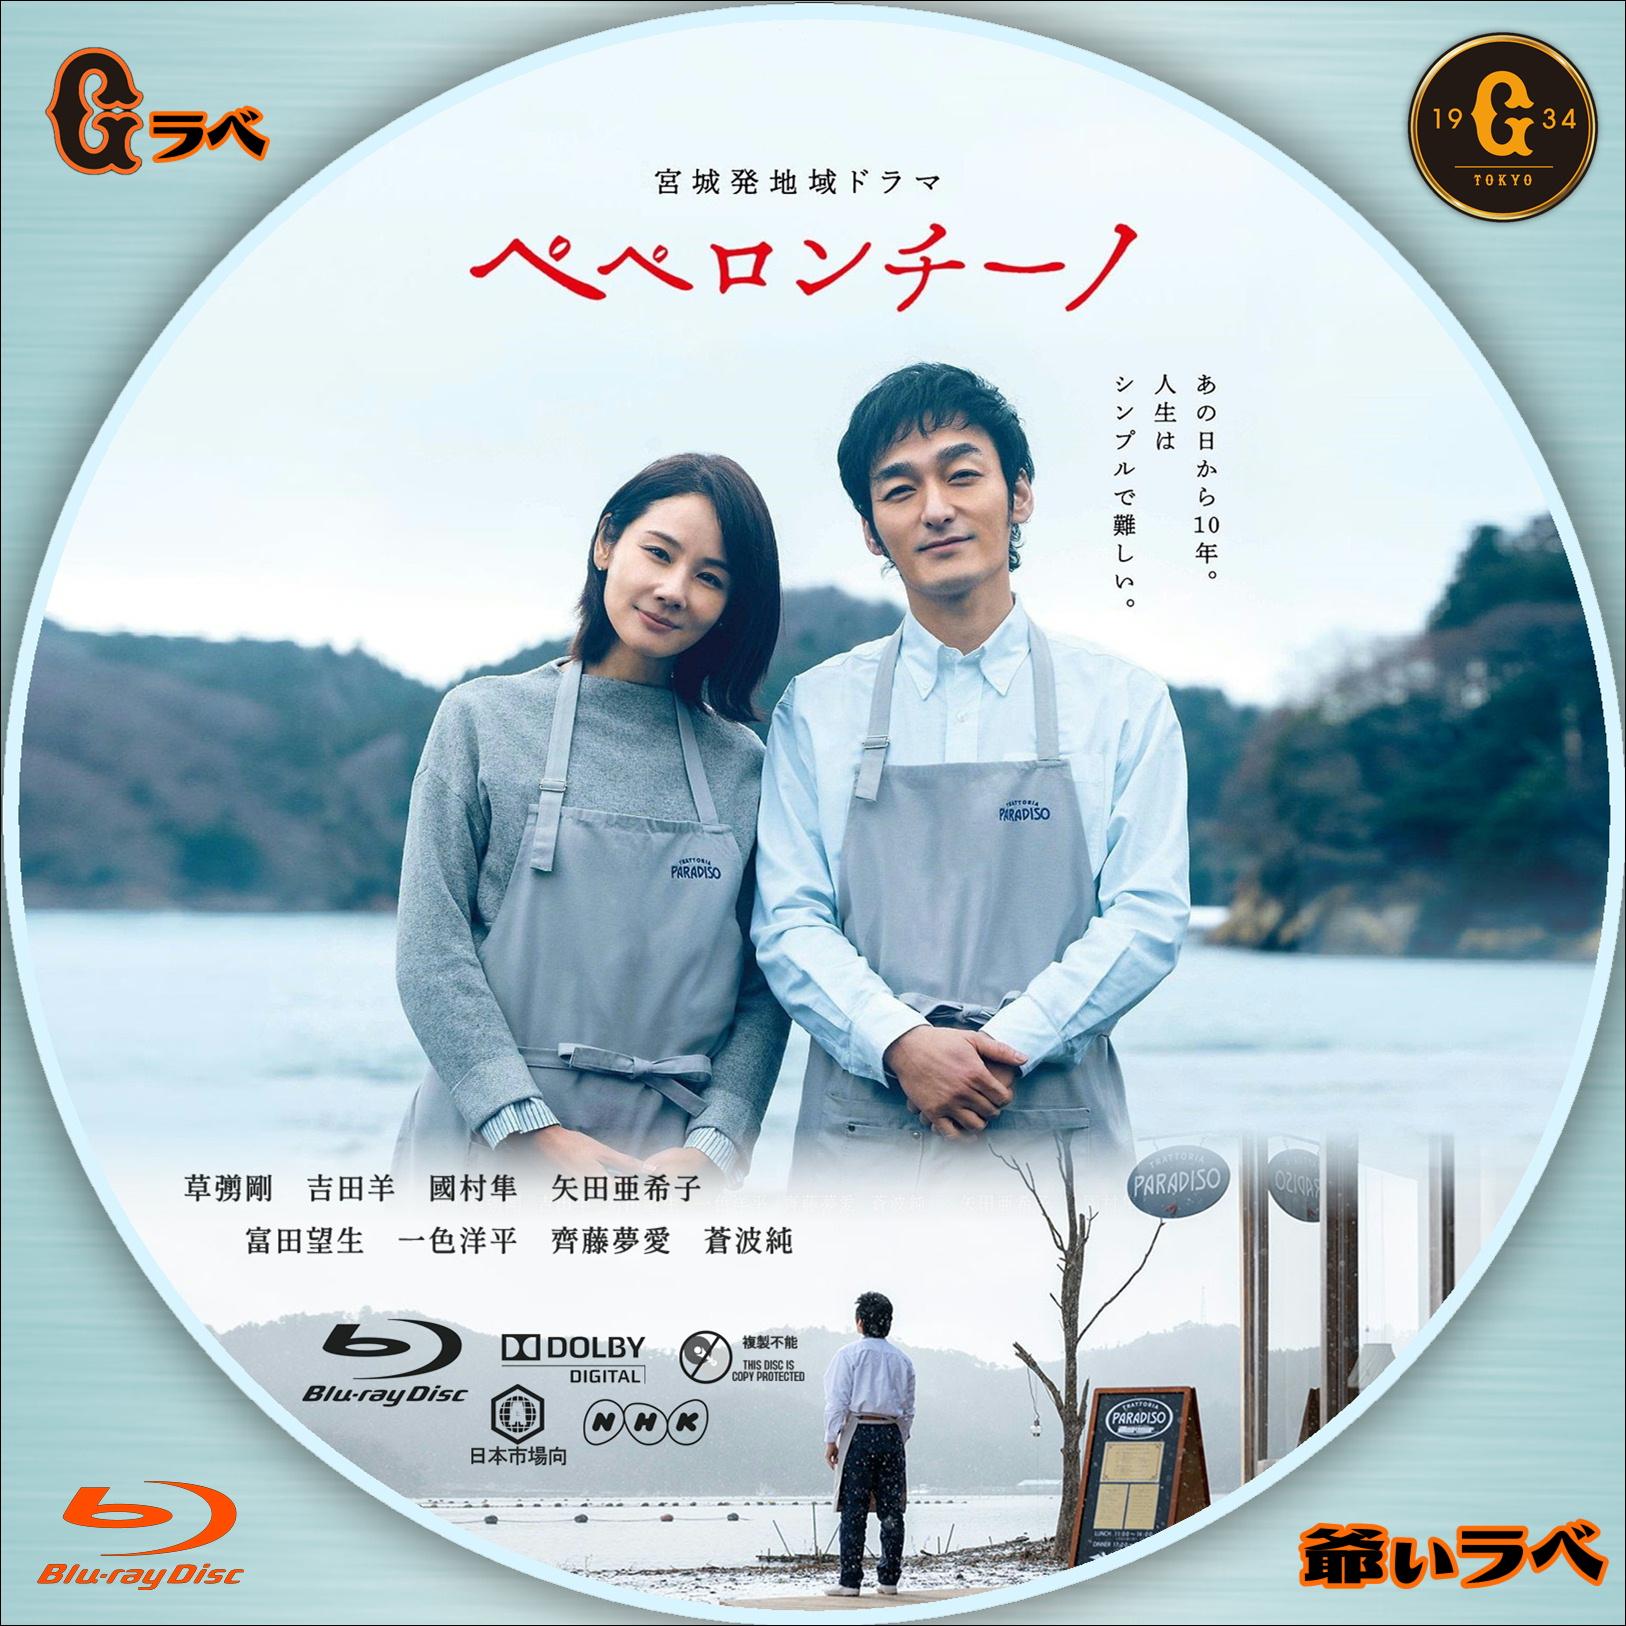 NHK 地域ドラマ ペペロンチーノ(Blu-ray)